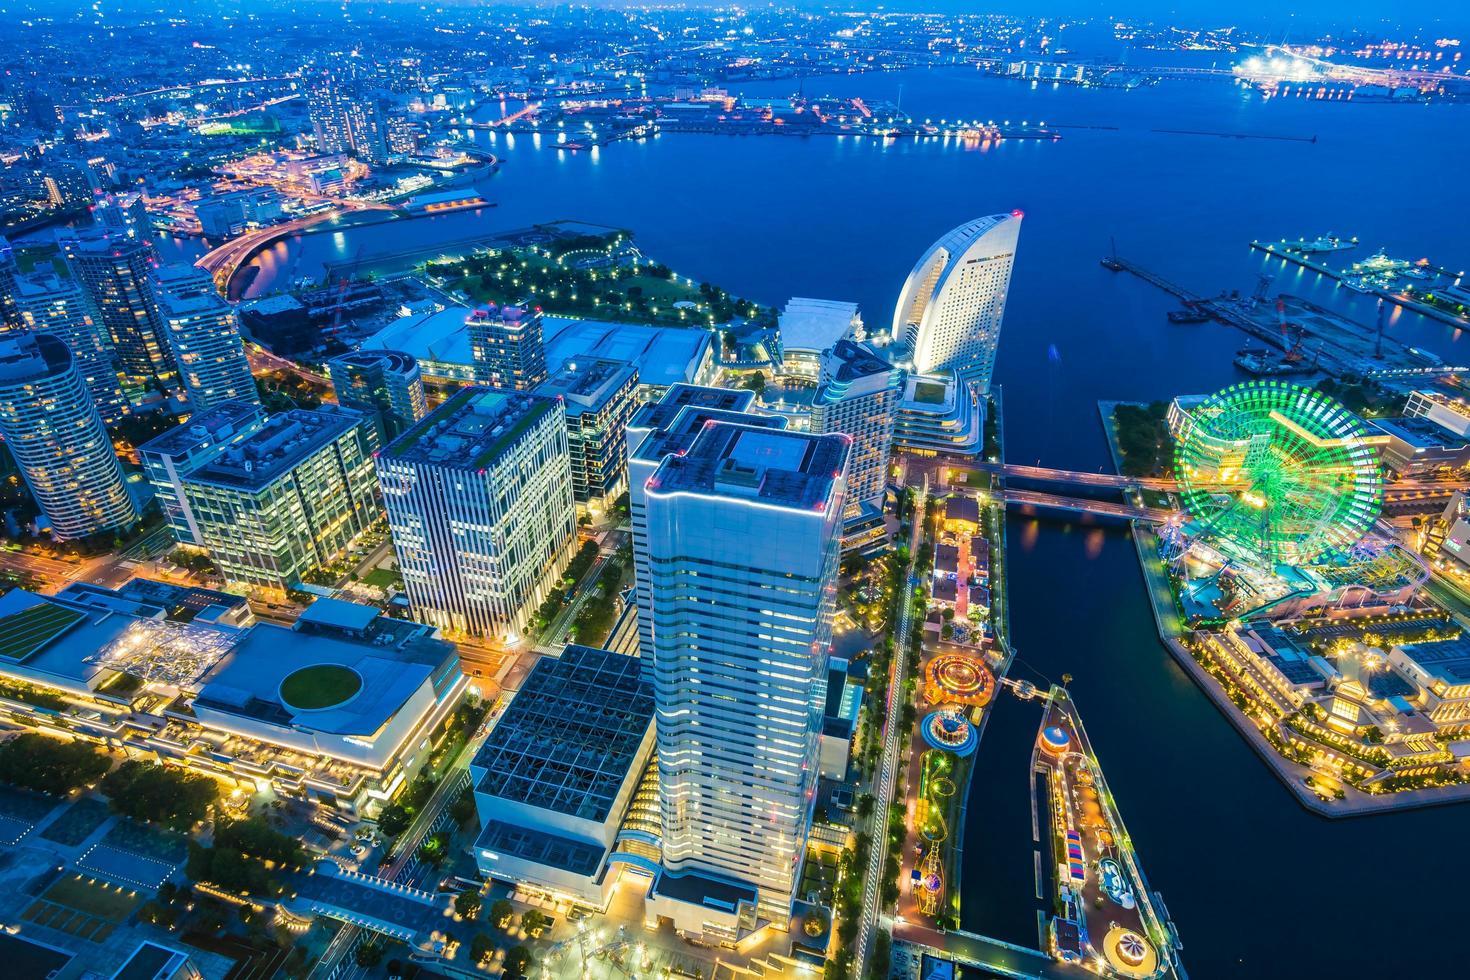 belos edifícios na cidade de Yokohama foto